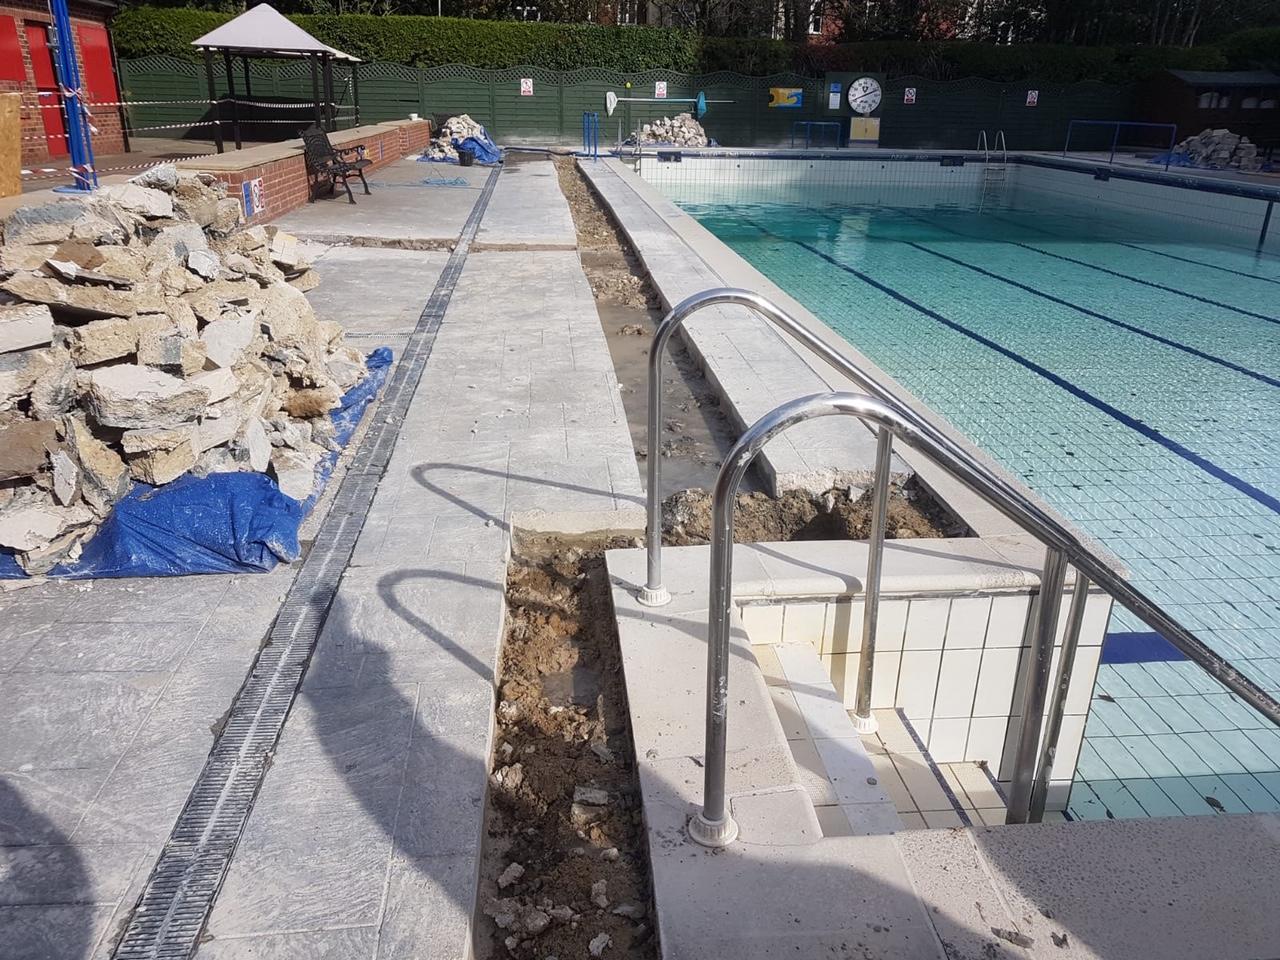 Pool Renovation Project 2020